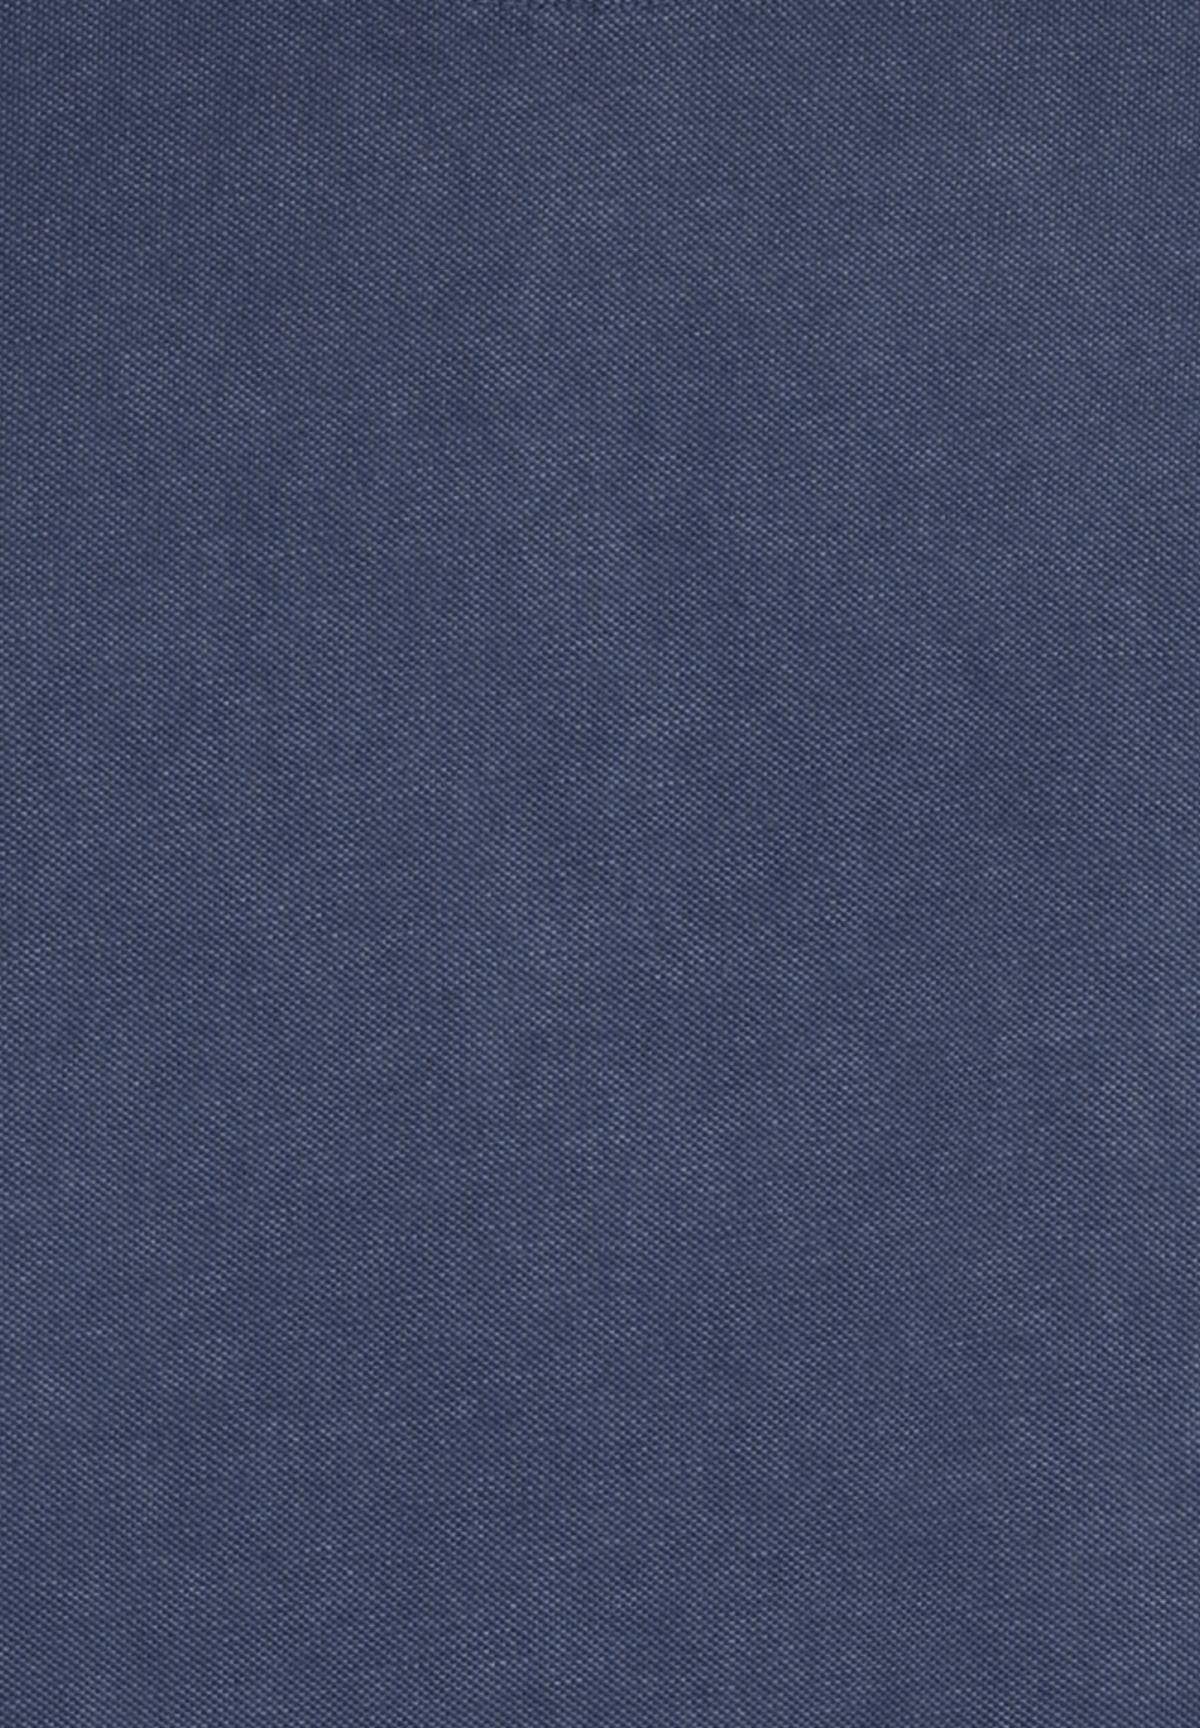 Camel-Active-Herren-Shirt-Poloshirt-Pique-Regular-Fit-NEU Indexbild 31